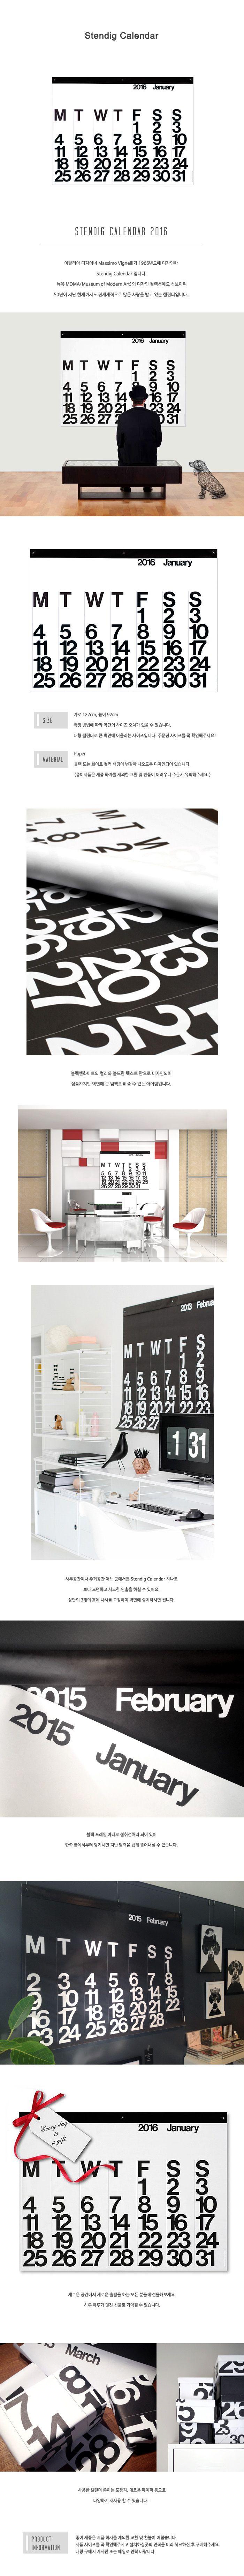 Stendig Calendar 2016 스탠딕 캘린더